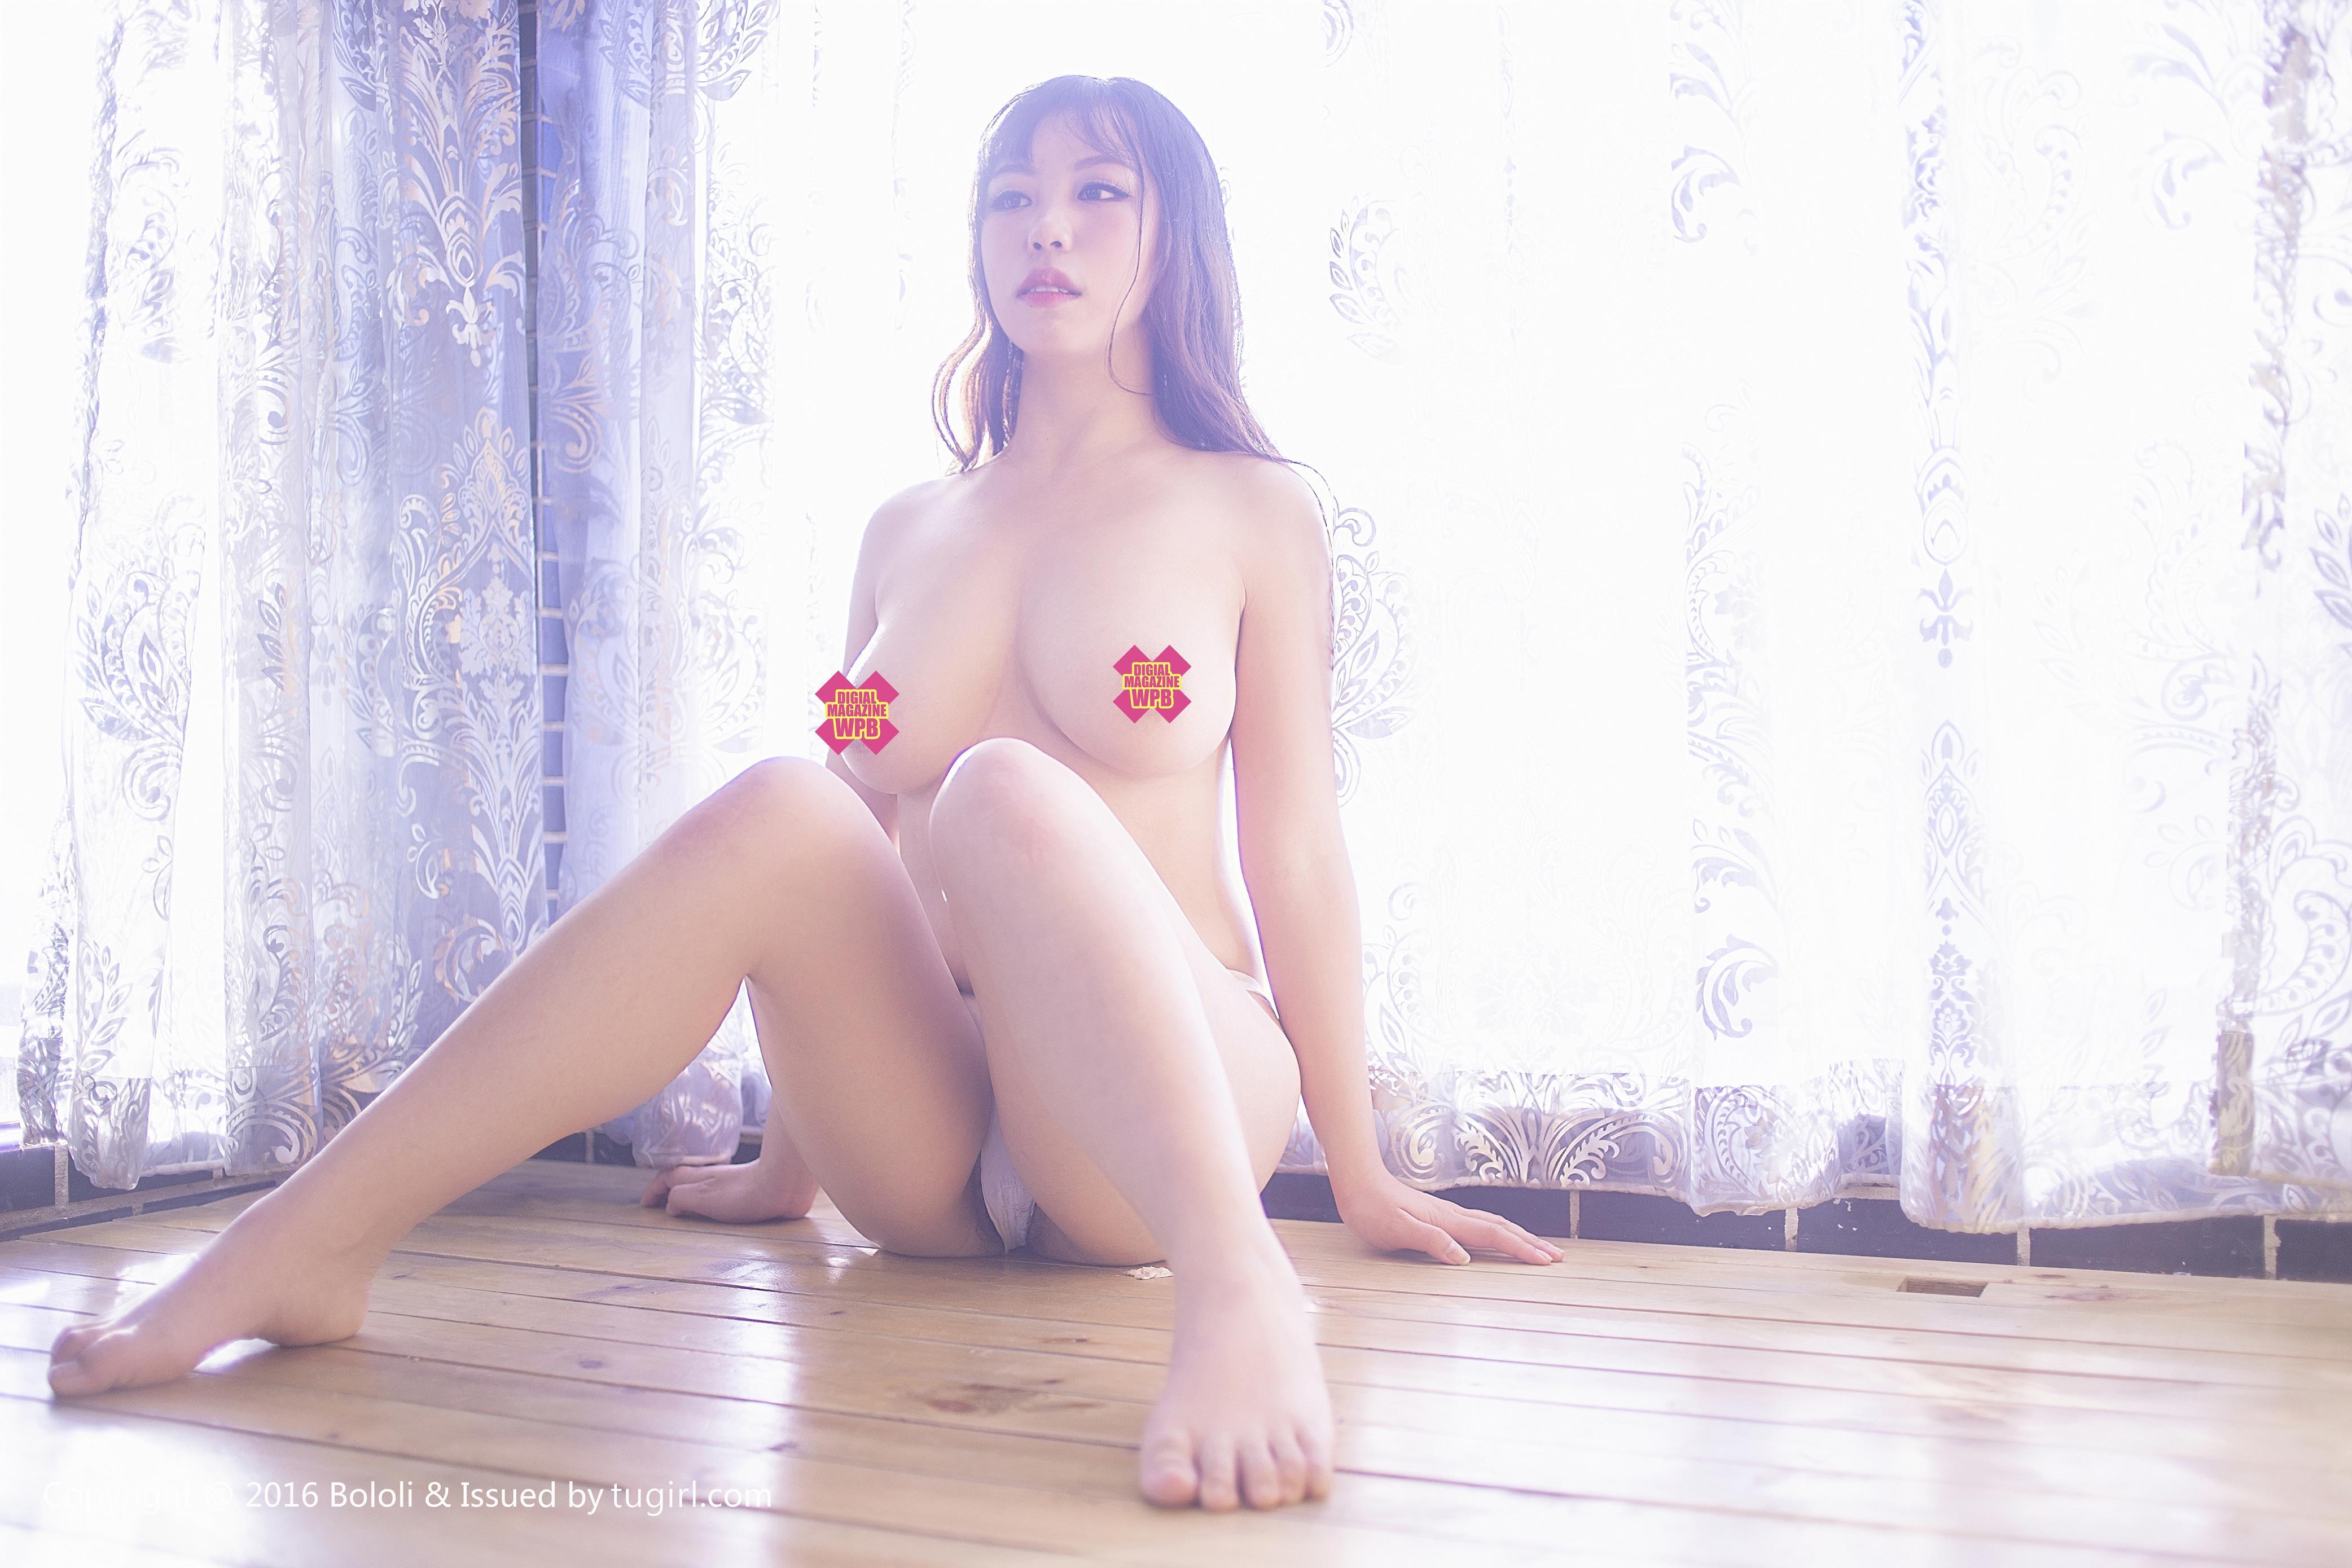 [BoLoli波萝社]BOL033 丰乳肥臀 雅末子 性感内衣与半裸玉体私房写真集